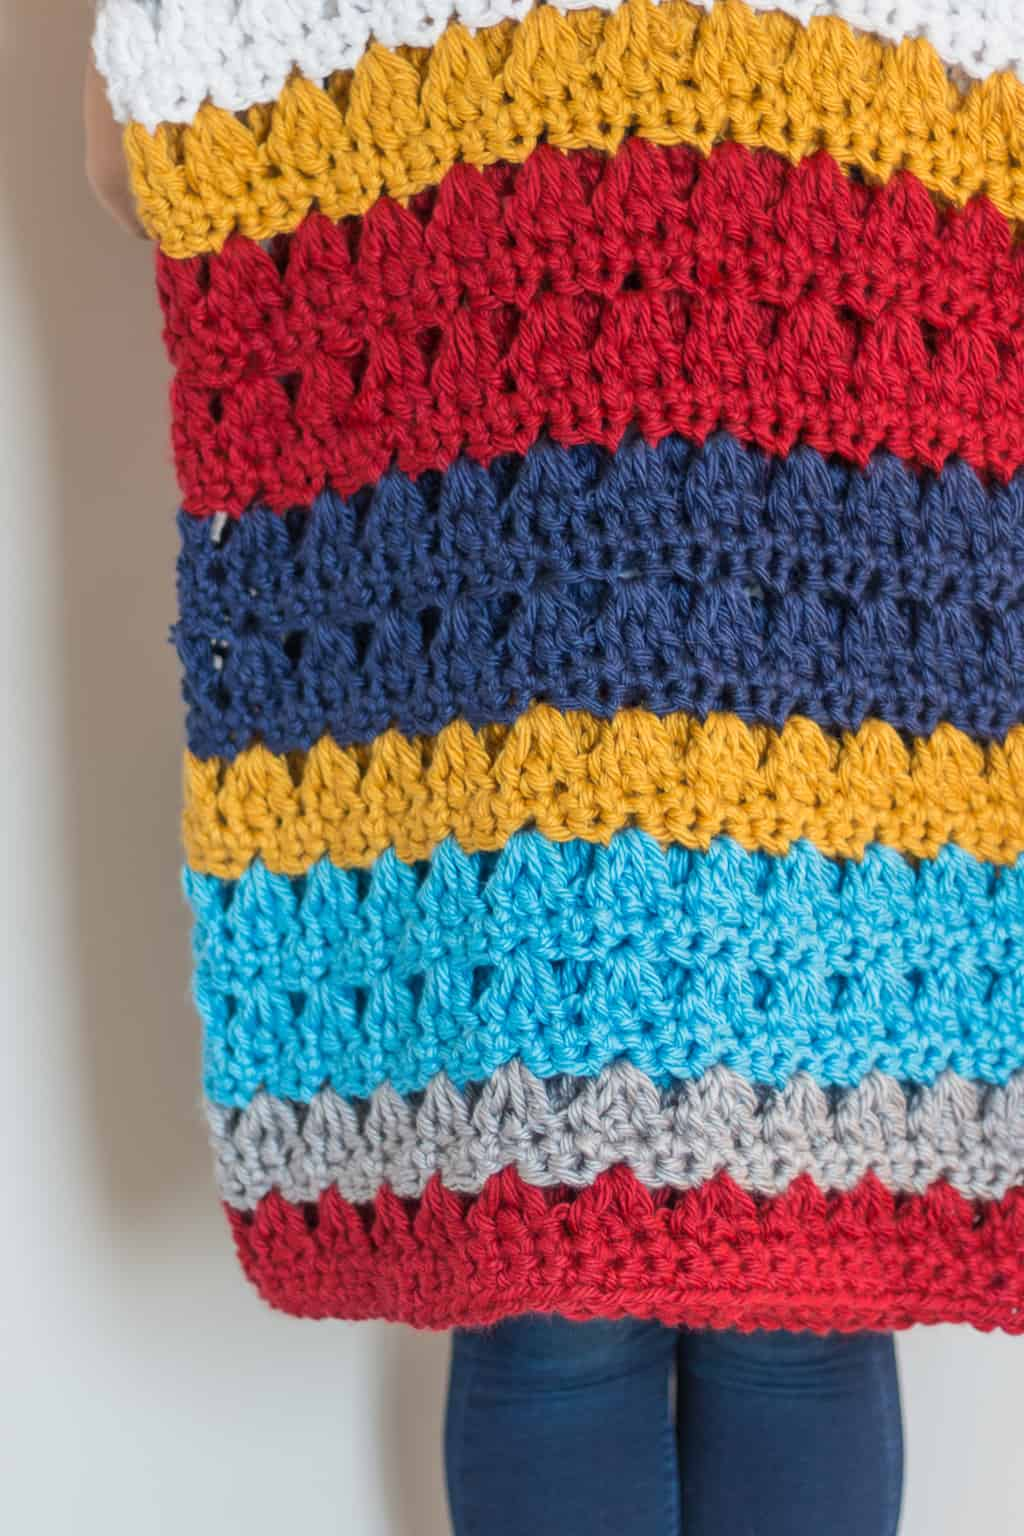 Willow Crochet Throw Pattern